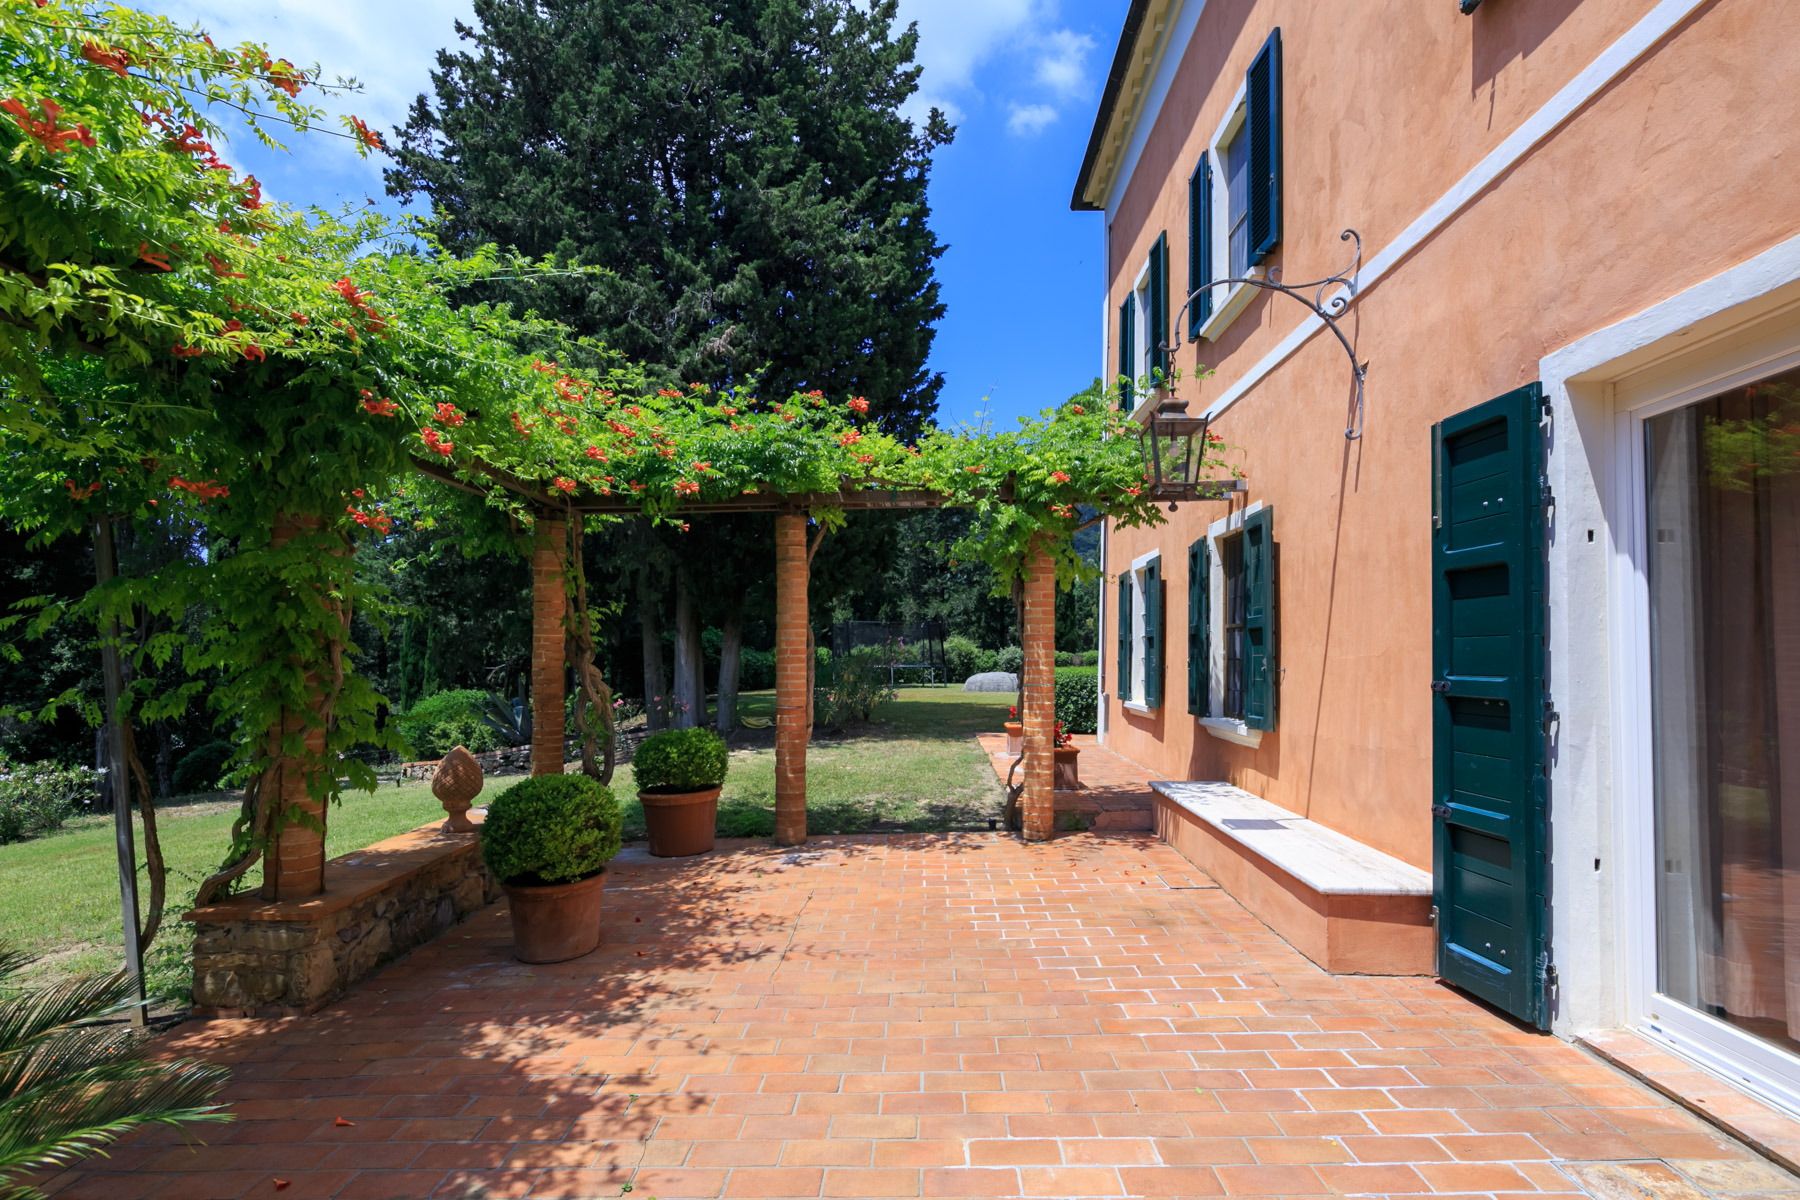 Villa in Vendita a Campiglia Marittima: 5 locali, 1100 mq - Foto 27